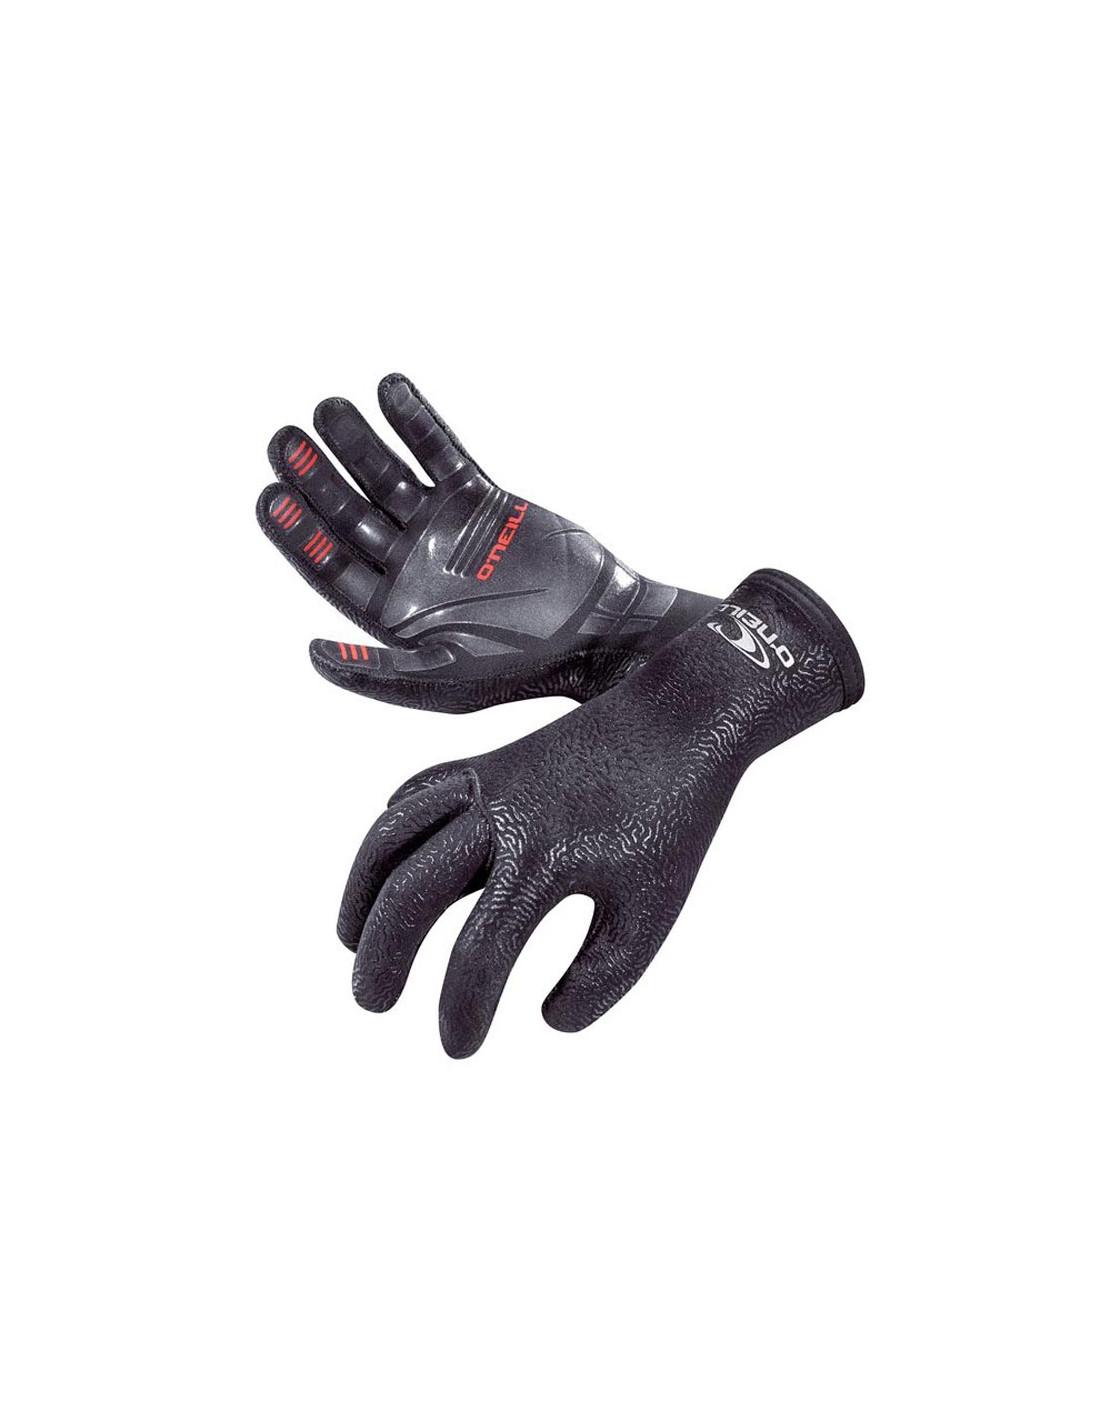 Lightweight ONeill Youth Kids Junior FLX 2mm Neoprene Wetsuit Gloves